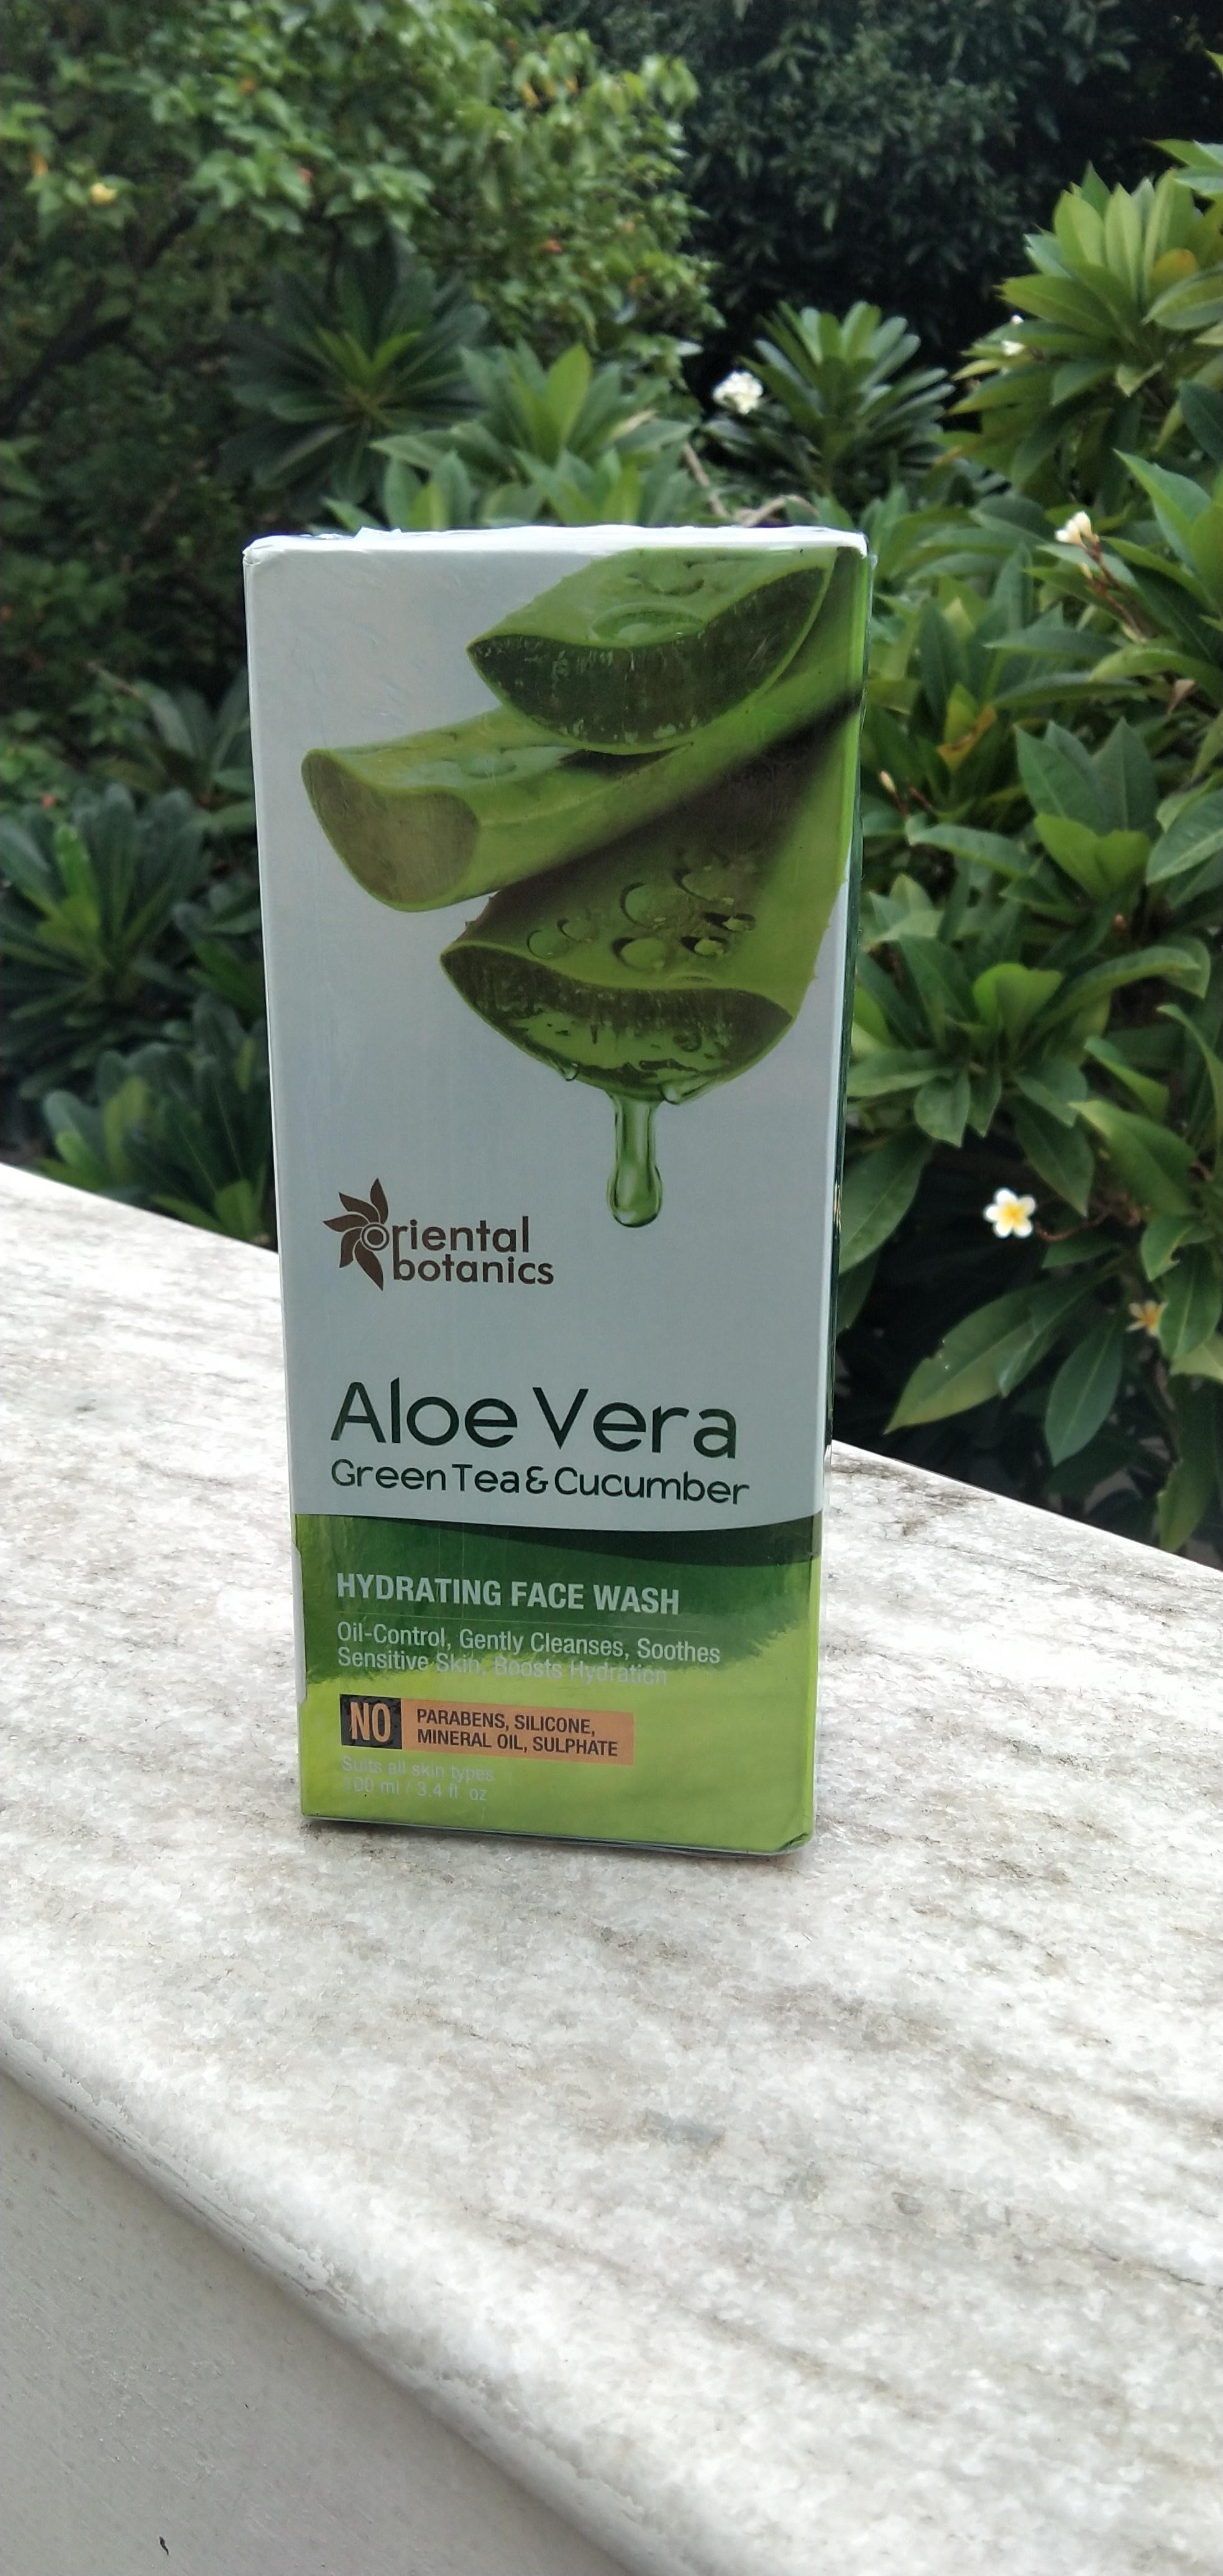 Oriental Botanics Aloe Vera, Green Tea & Cucumber Hydrating Face Wash pic 2-Moisturizing face wash-By shania_sardar